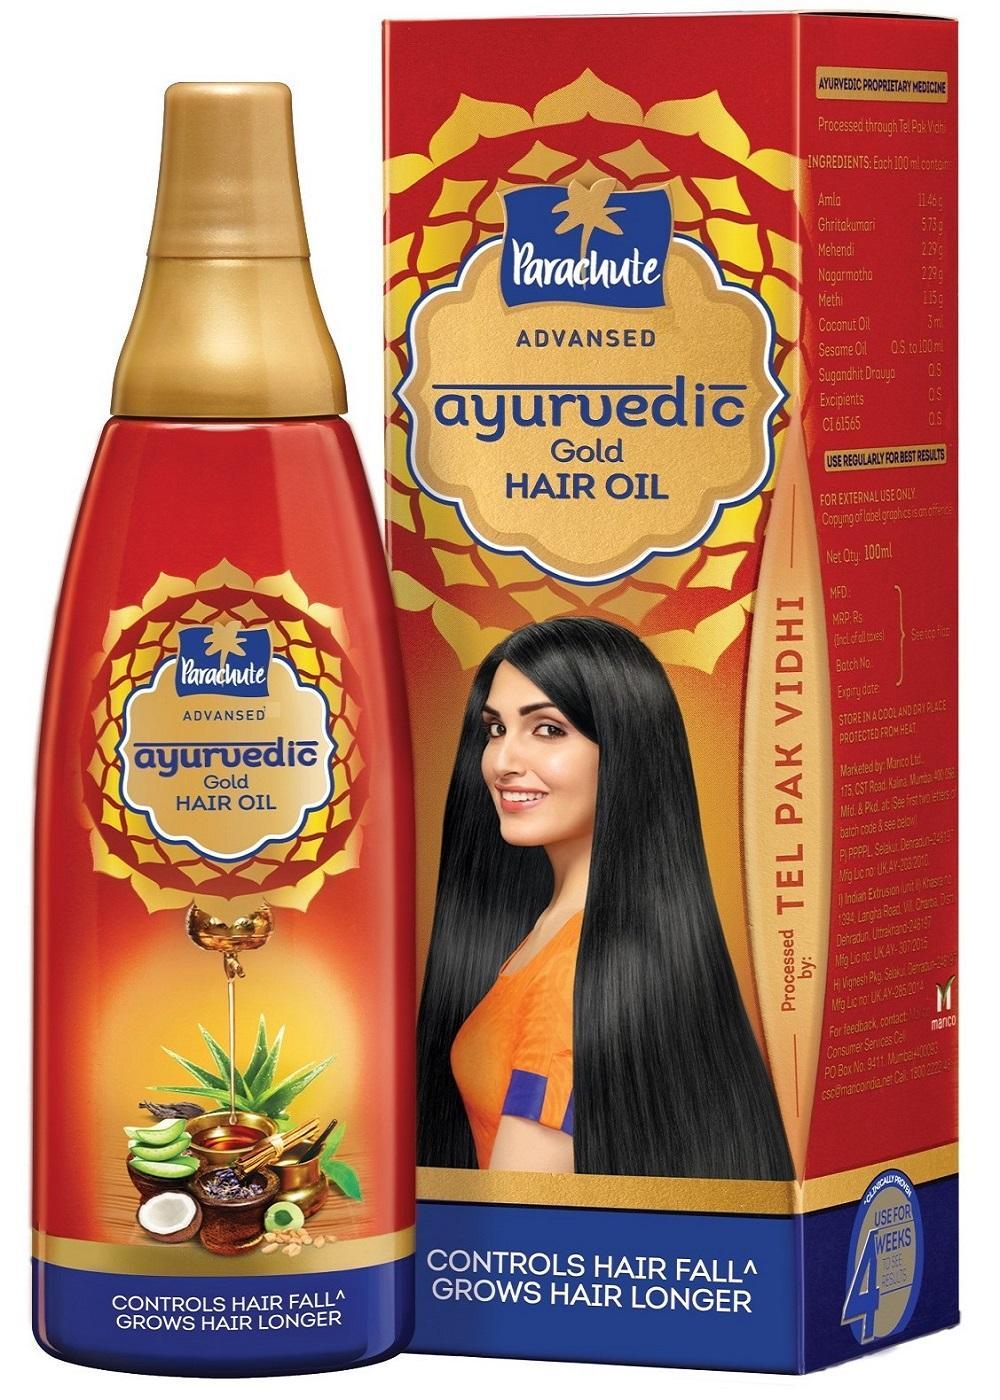 Buy Parachute Advanced Ayurvedic Gold Hair Oil 200ml